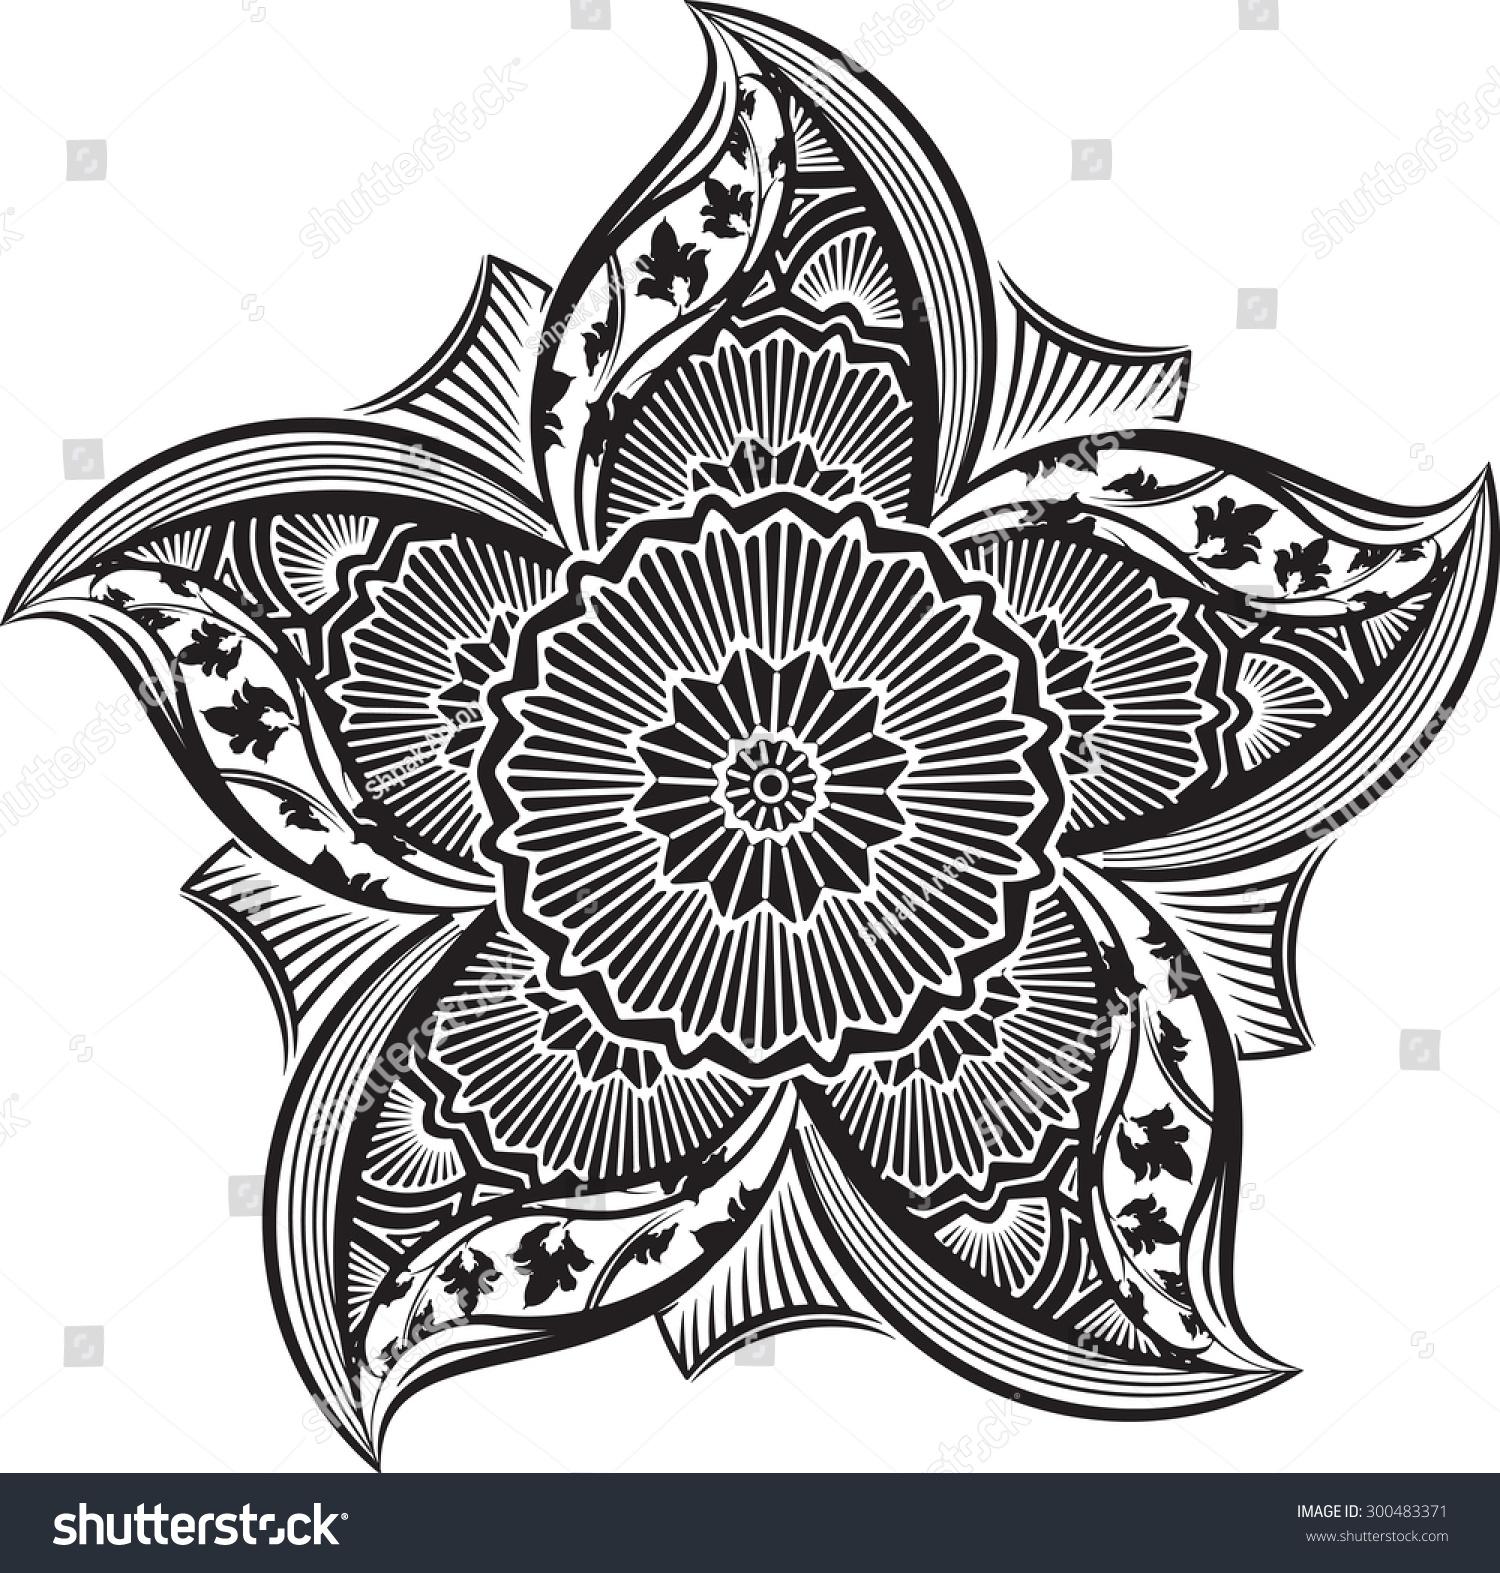 Round Asymmetrical Decorative Element